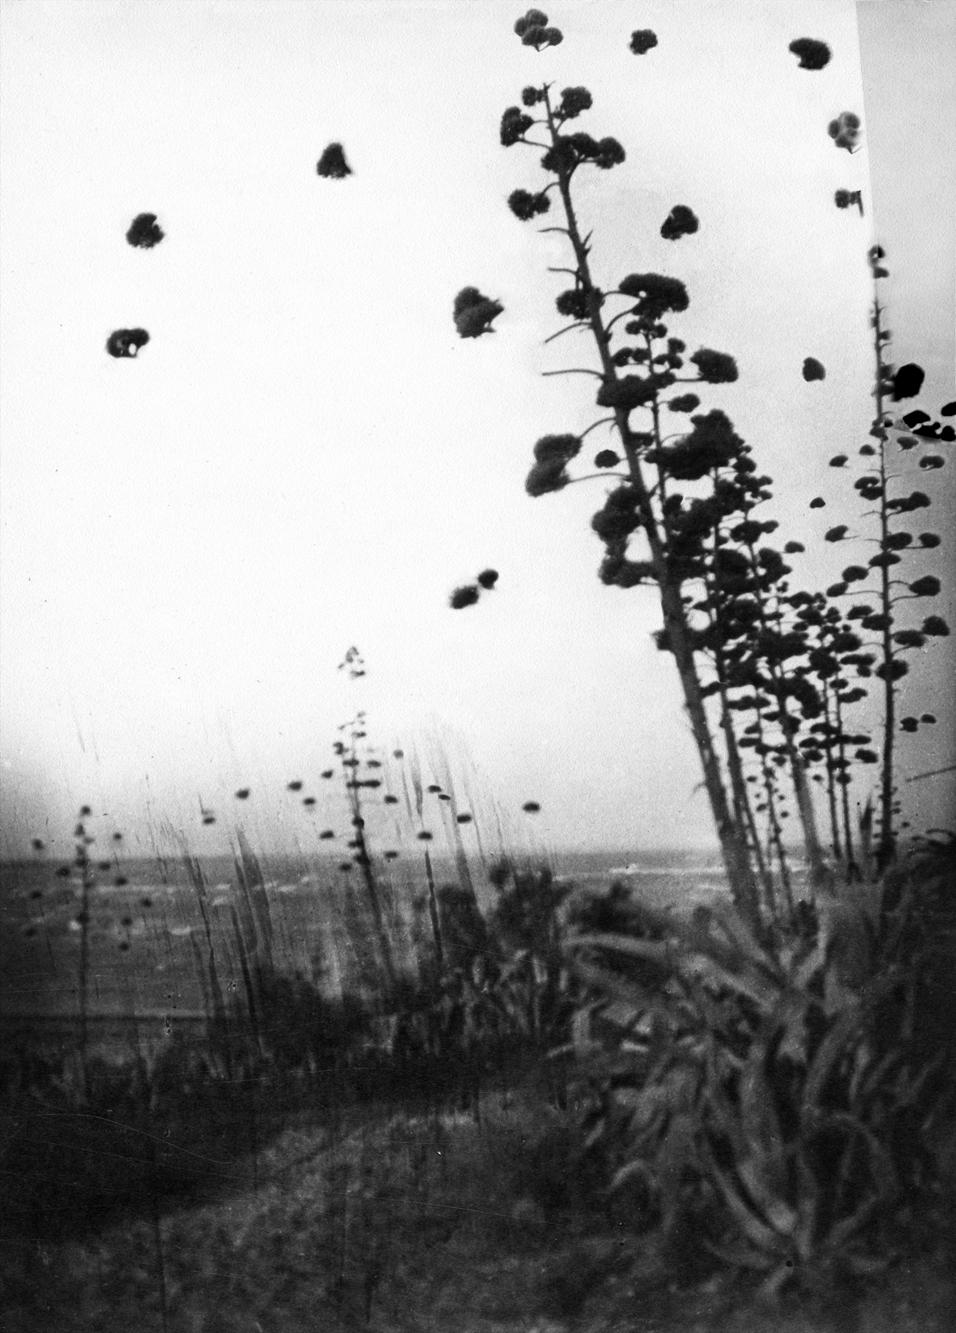 """Open Tree #5"" 2014-2018, stampa ai sali d'argento, 44 x 35,5 cm"